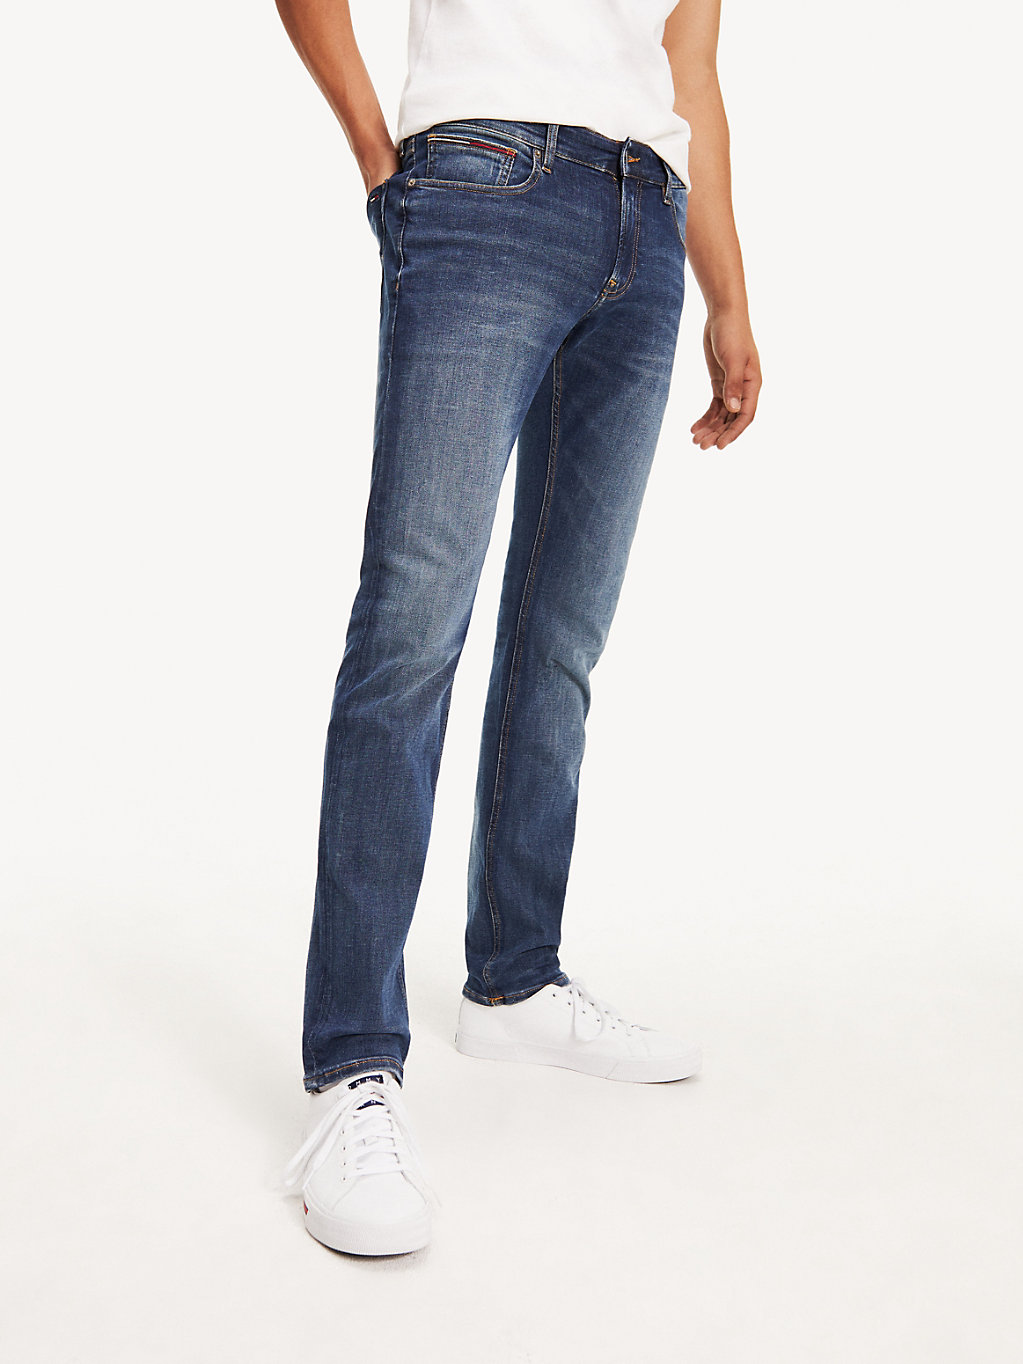 Tommy Hilfiger - Slim Stretch Denim Jeans - 1